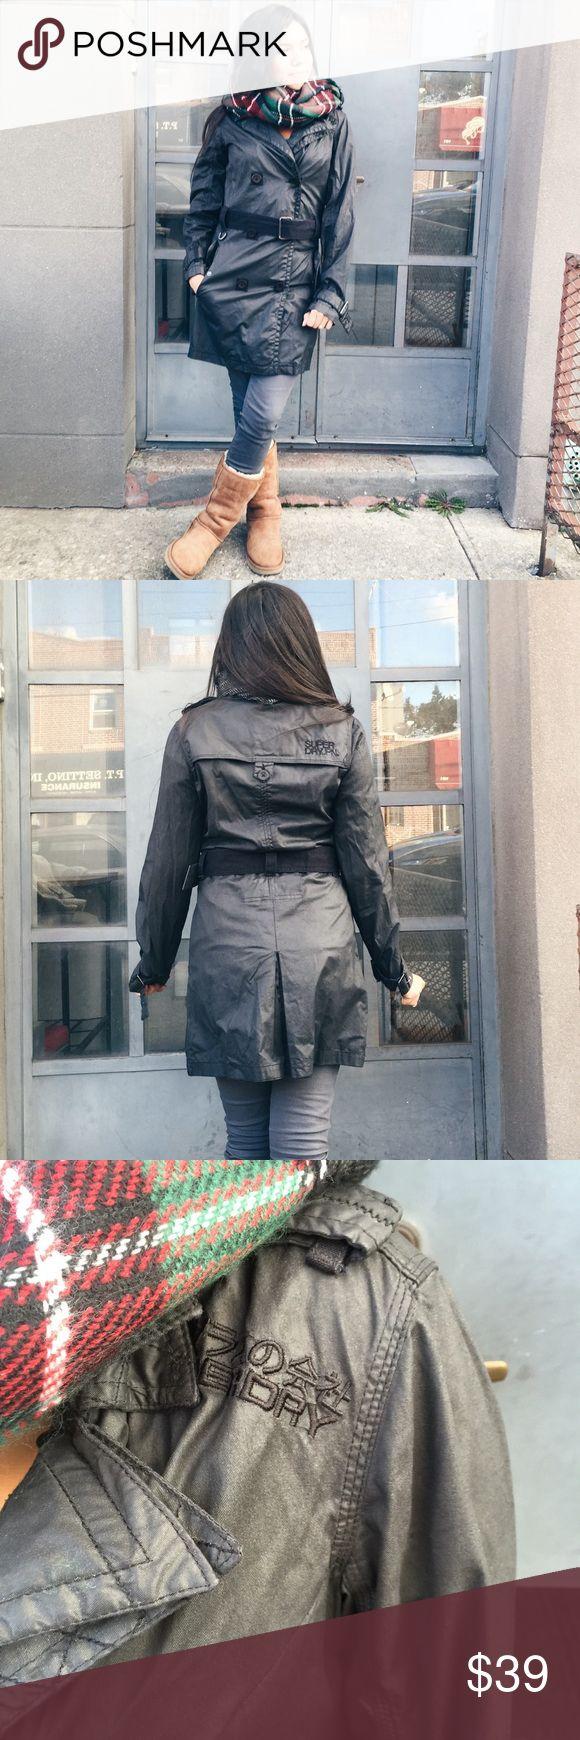 Superdry jacket Sz small S black Superdry jacket. Sz small. Good condition. Superdry Jackets & Coats